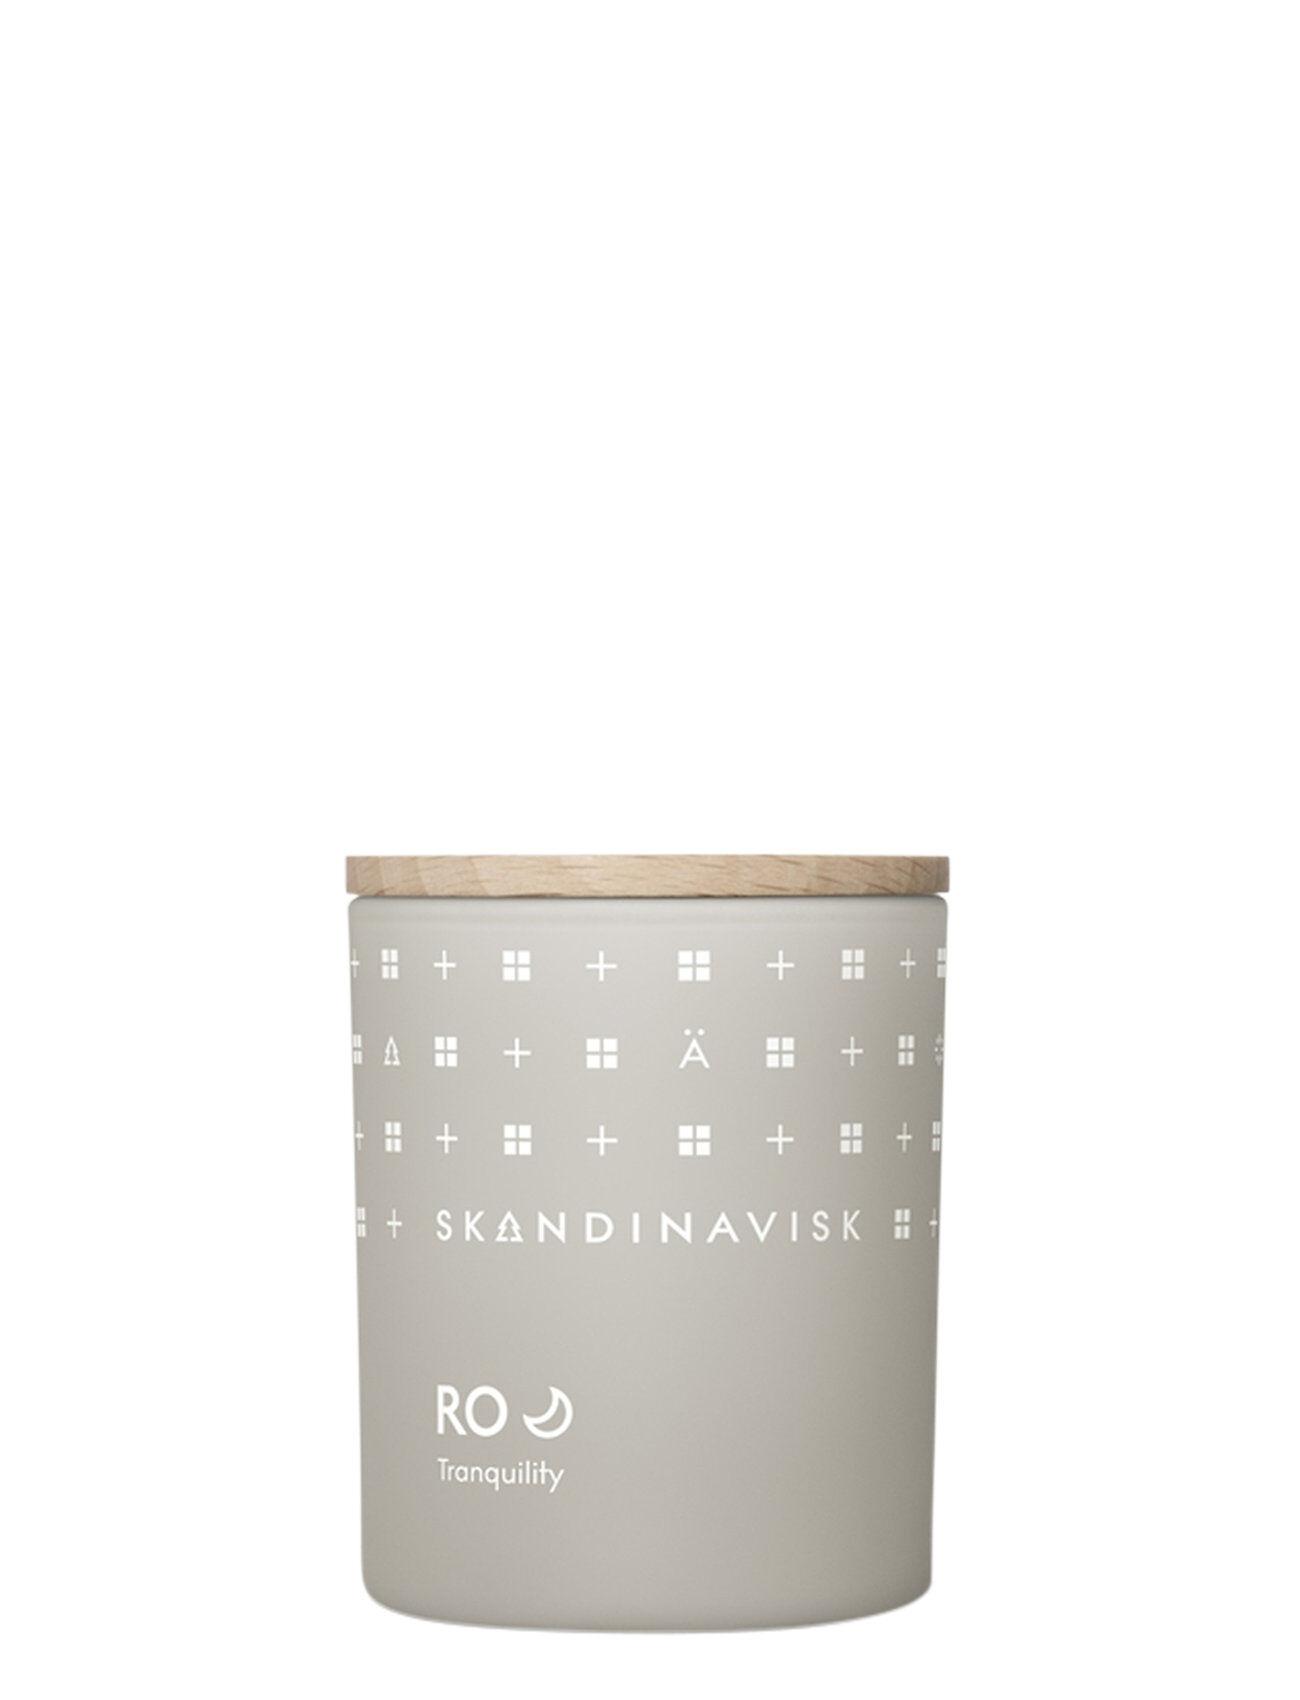 Skandinavisk Ro Scented Candle With Lid 65g Tuoksukynttilä Nude Skandinavisk